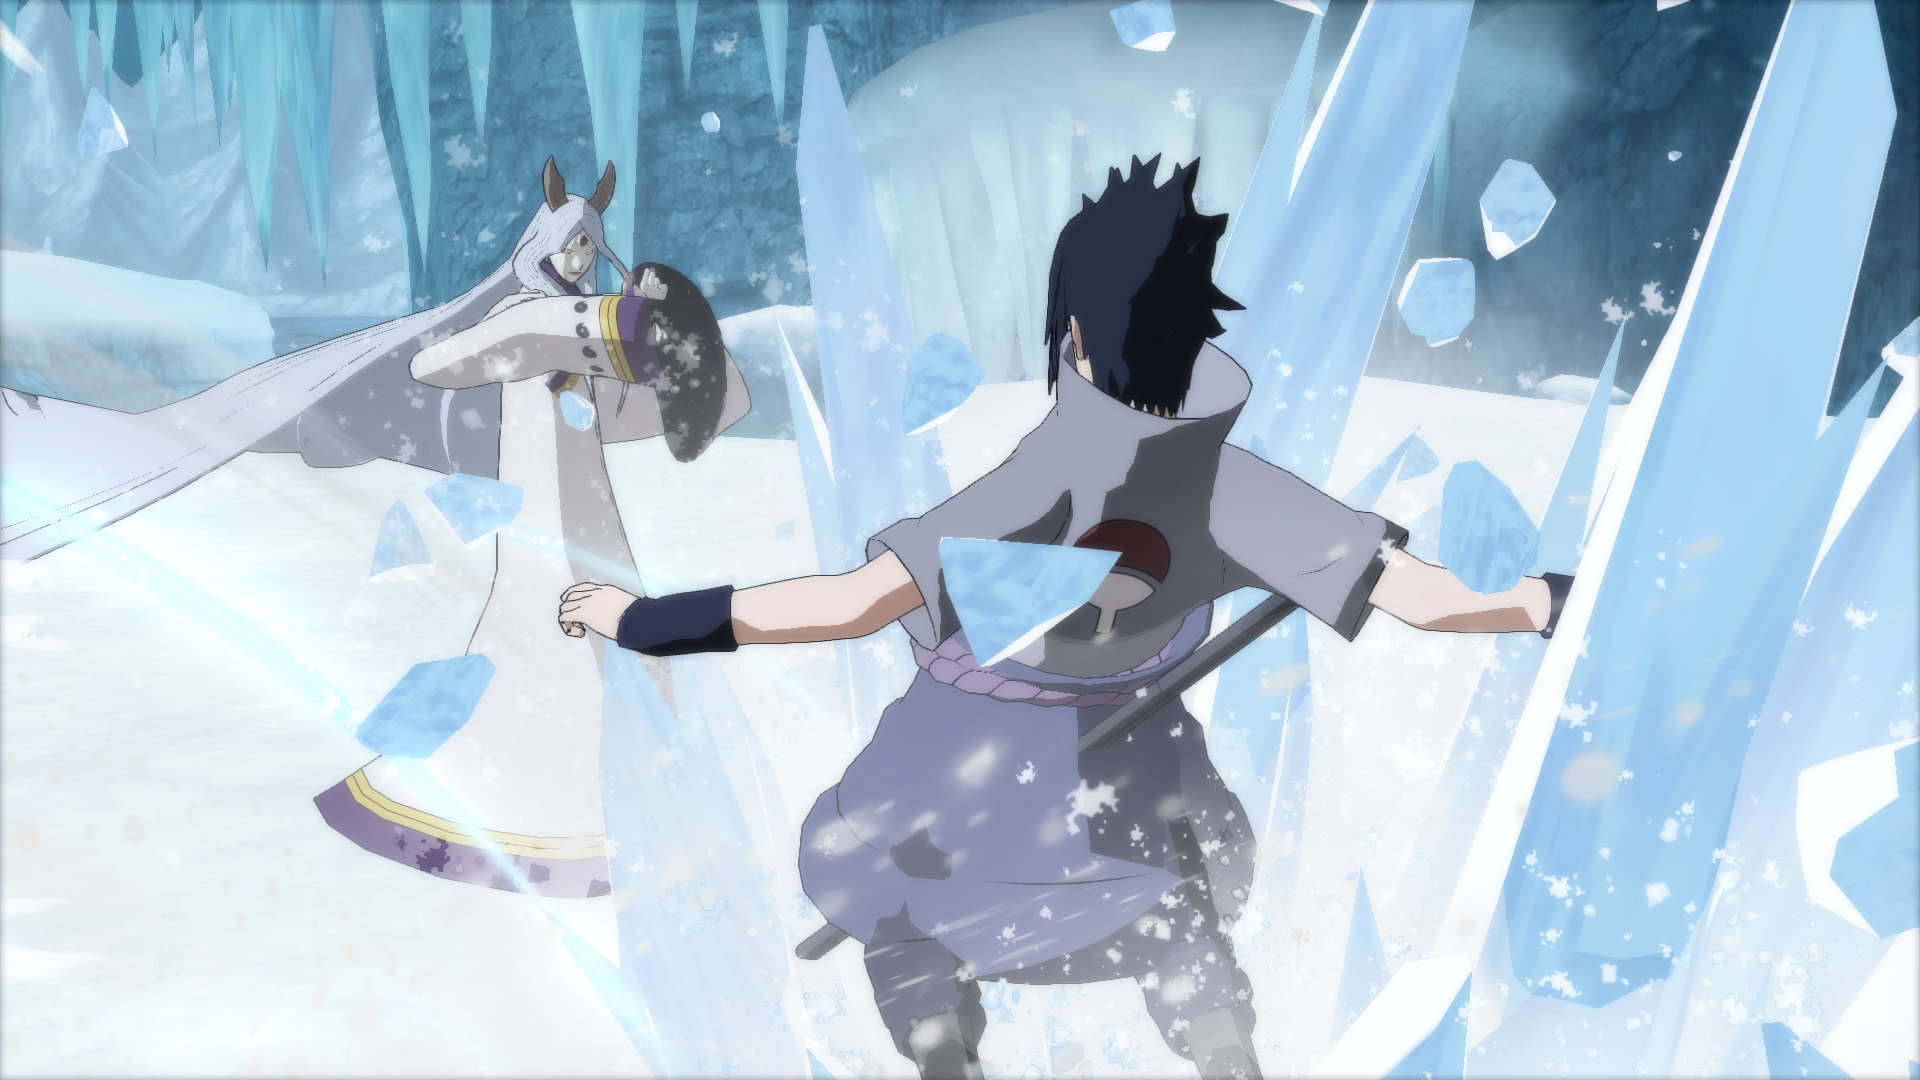 New screenshots and gameplay mechanics revealed for Naruto Shippuden